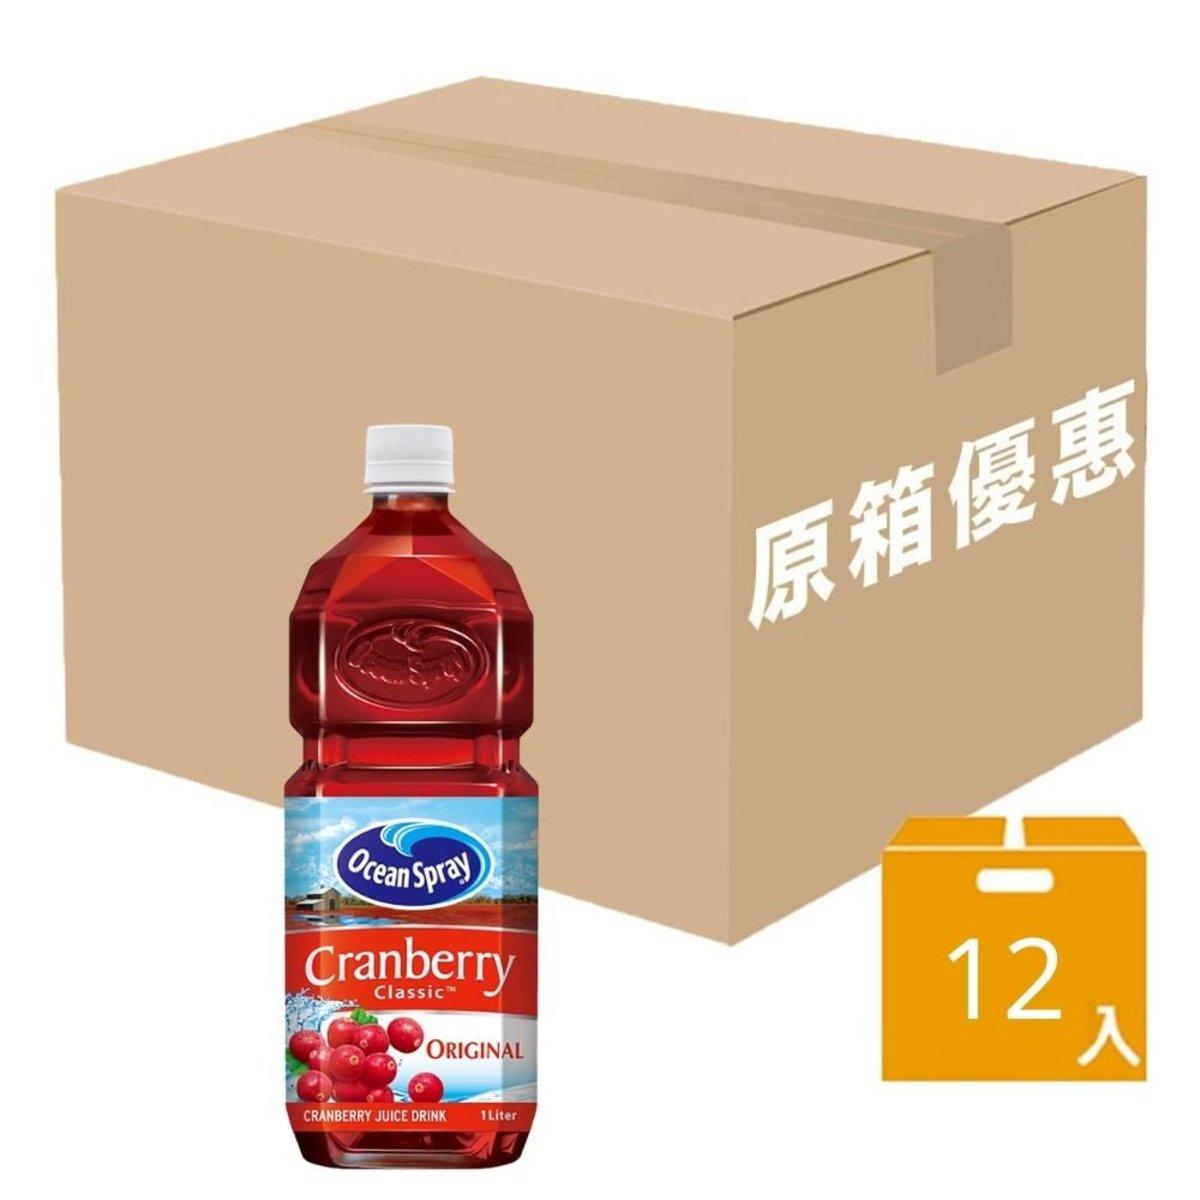 Cranberry Classic Juice 1L x12 [full case]